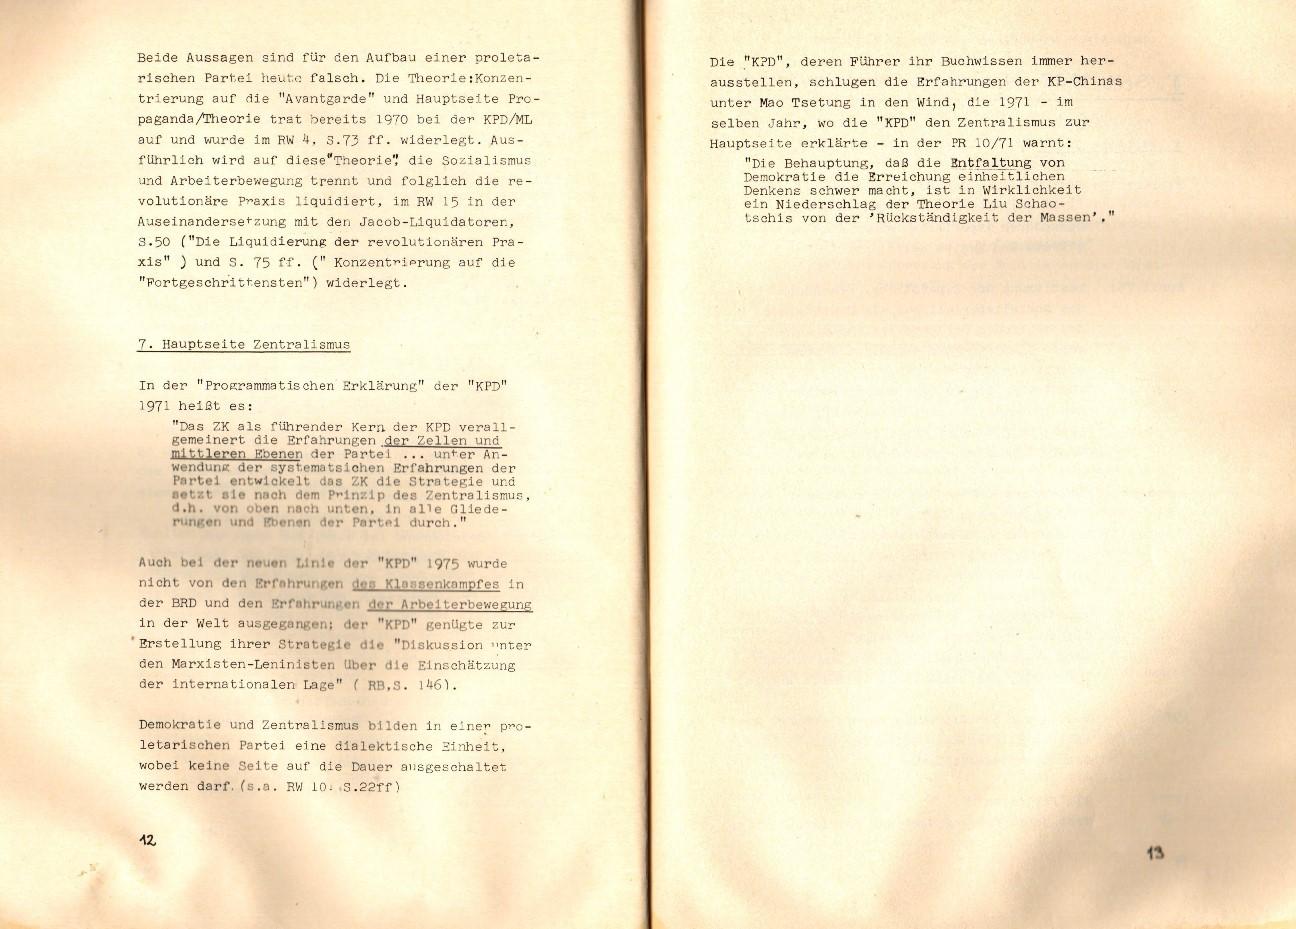 KABD_1978_Argumentationshilfen_08